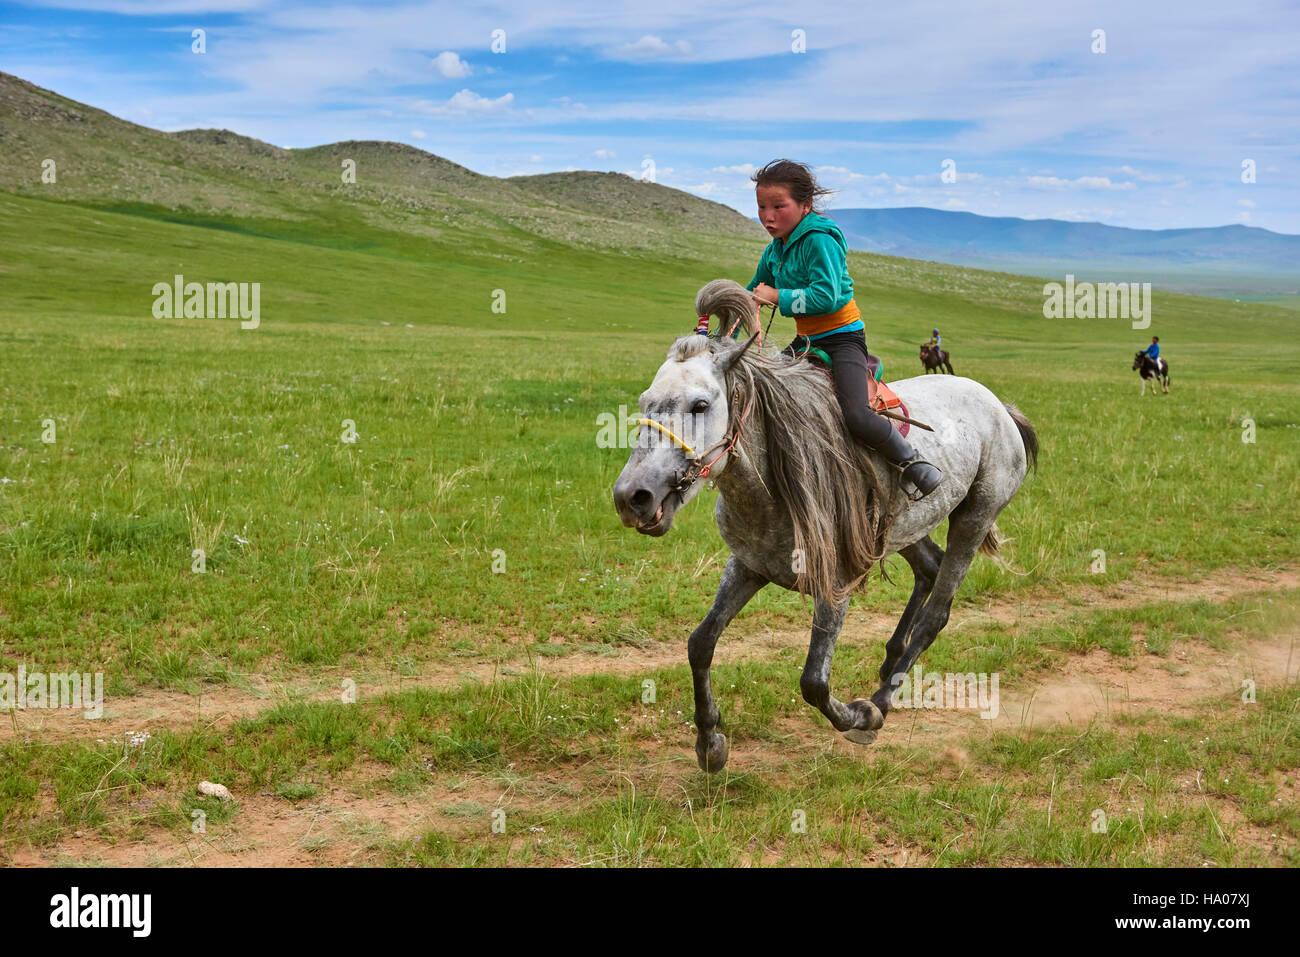 Mongolia, provincia de Bayankhongor, Festival de Naadam, tradicionales, carreras de caballos Imagen De Stock